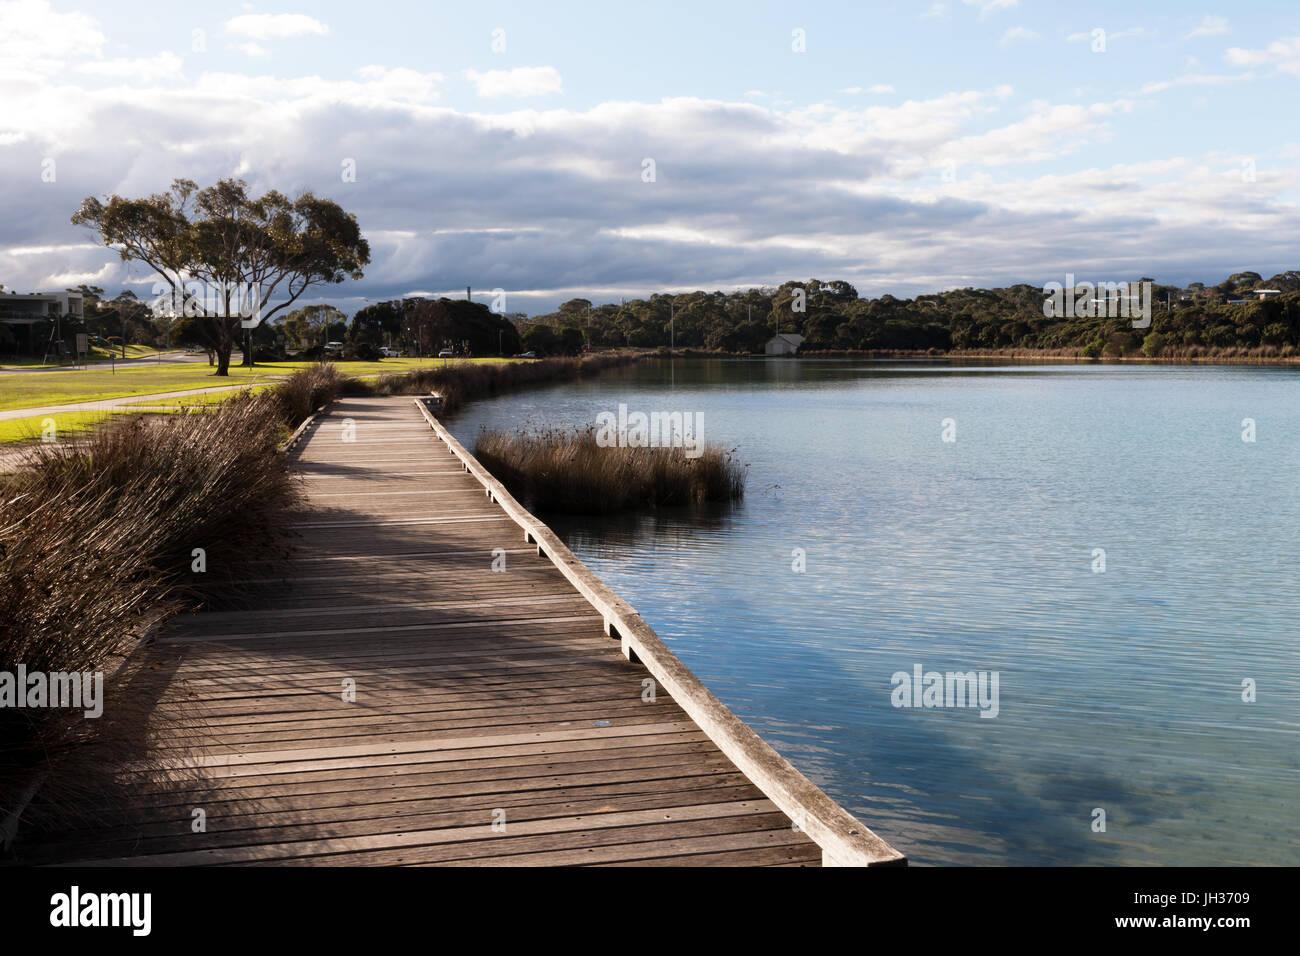 Estuarine lake and Boardwalk  Anglesea  on the Great Ocean Road, Victoria, Australia - Stock Image